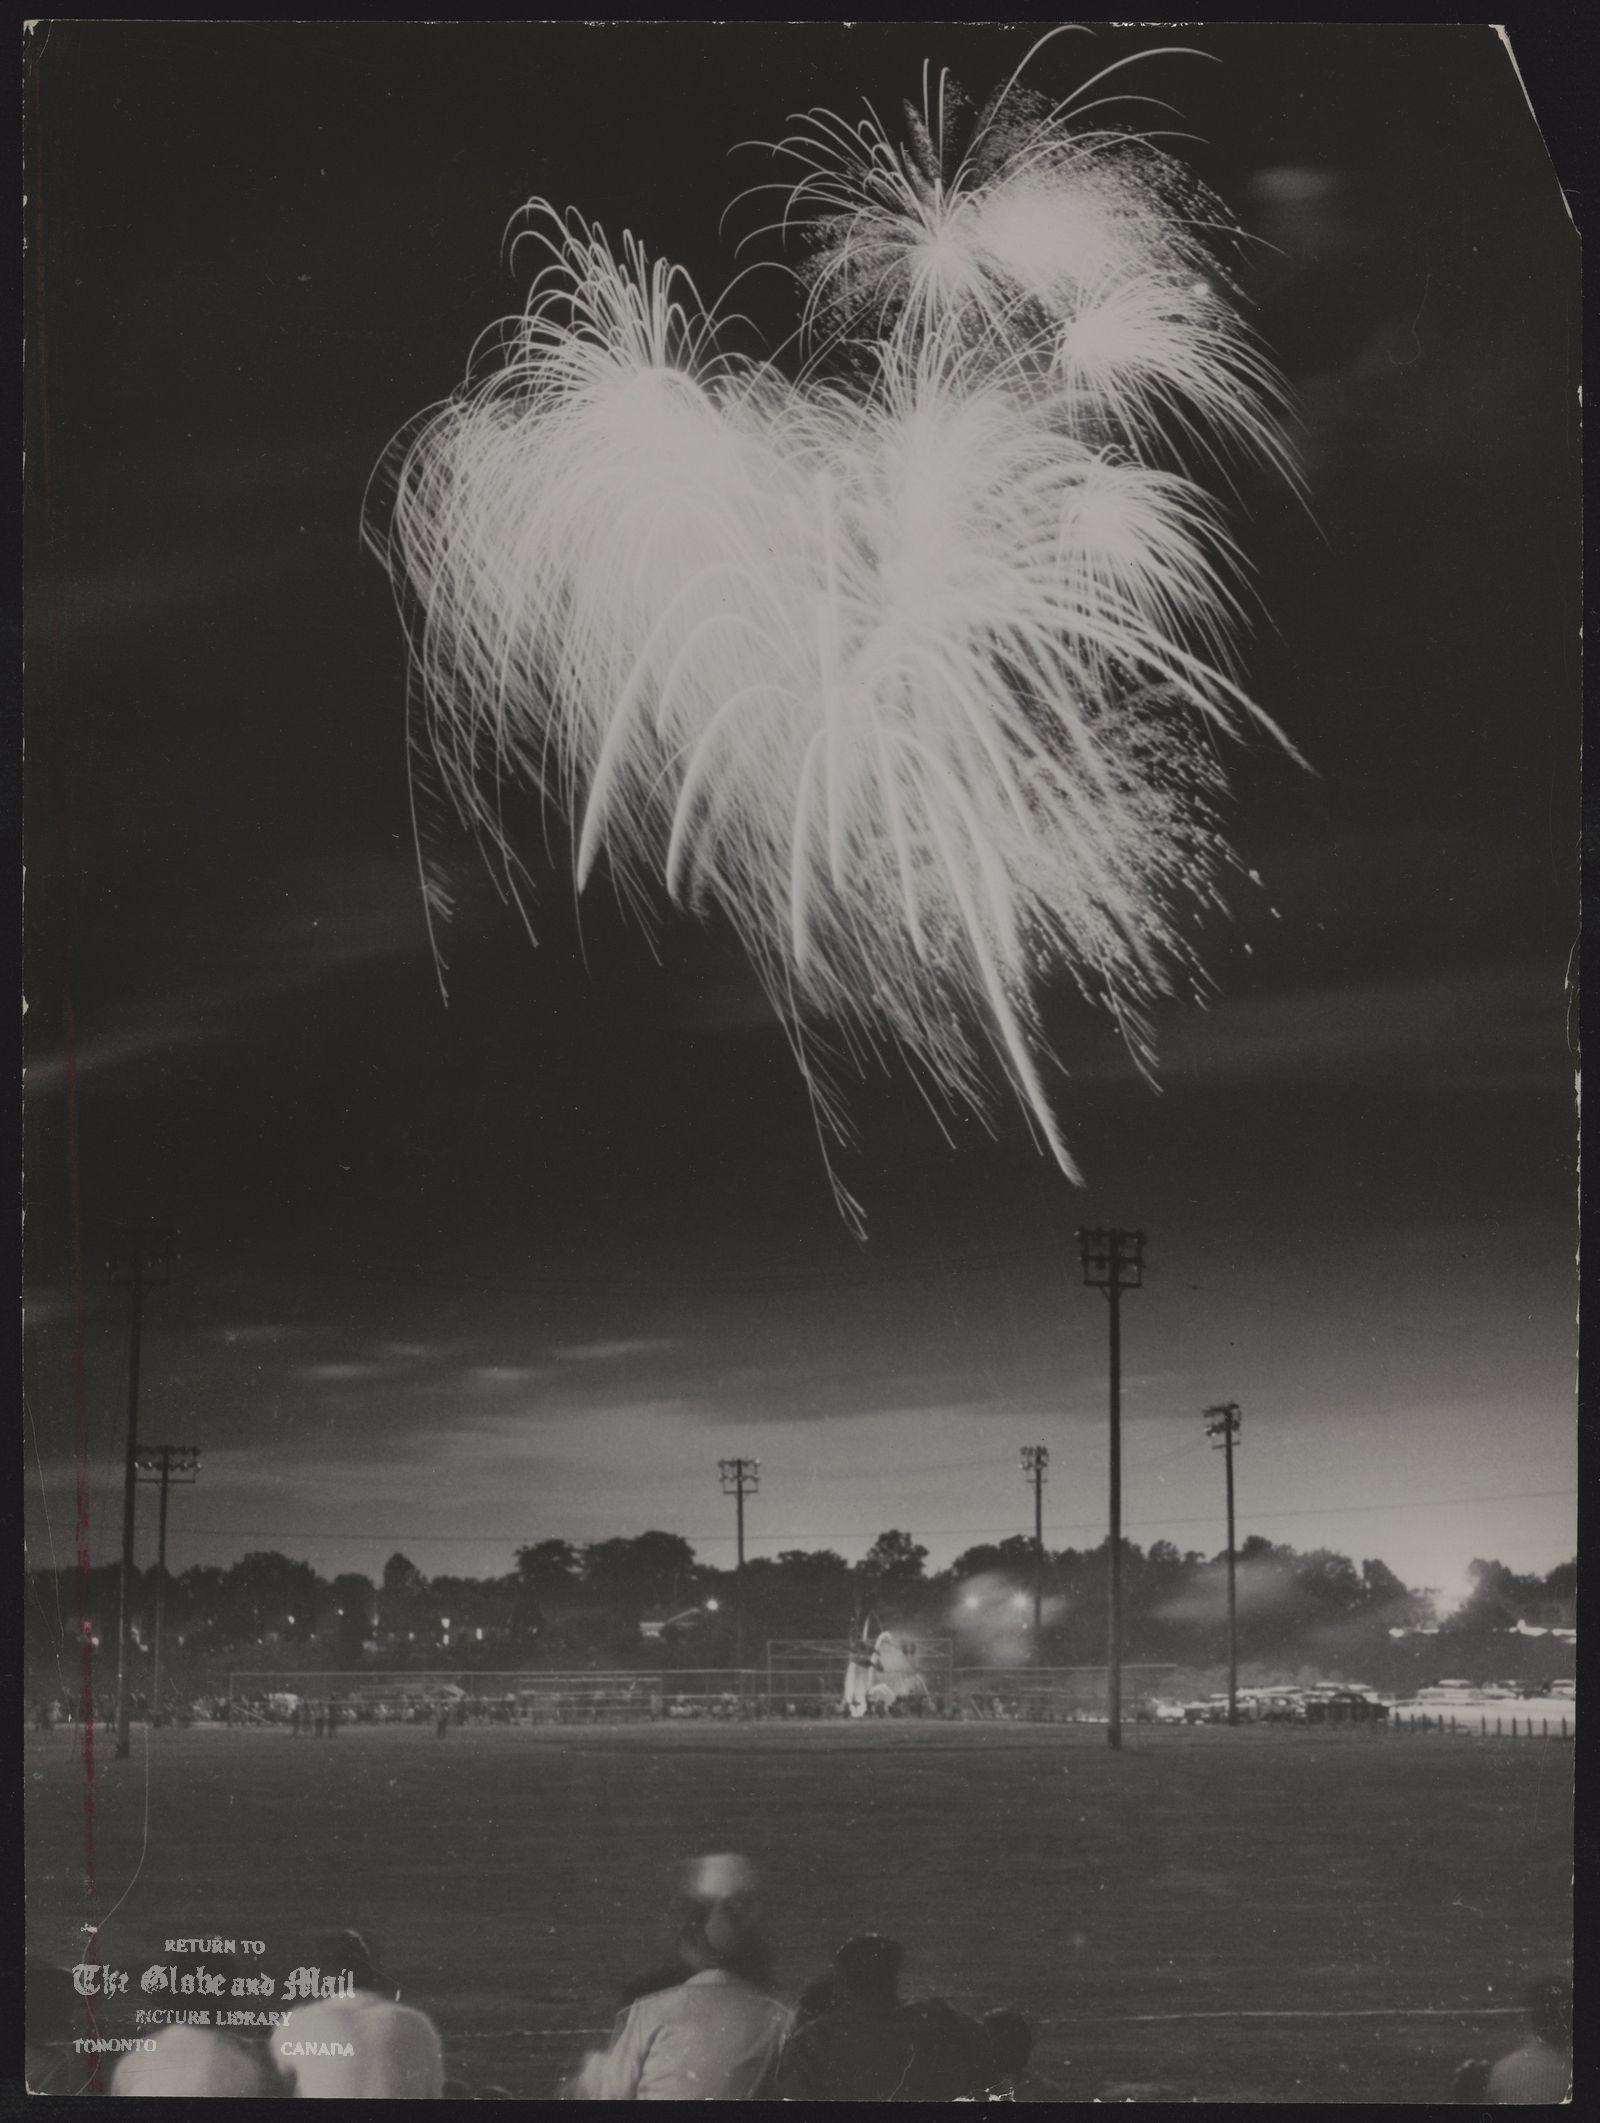 FIREWORKS (LF) [July 1, 1960], fireworks over Cedarvale Park mark DOMINION DAY